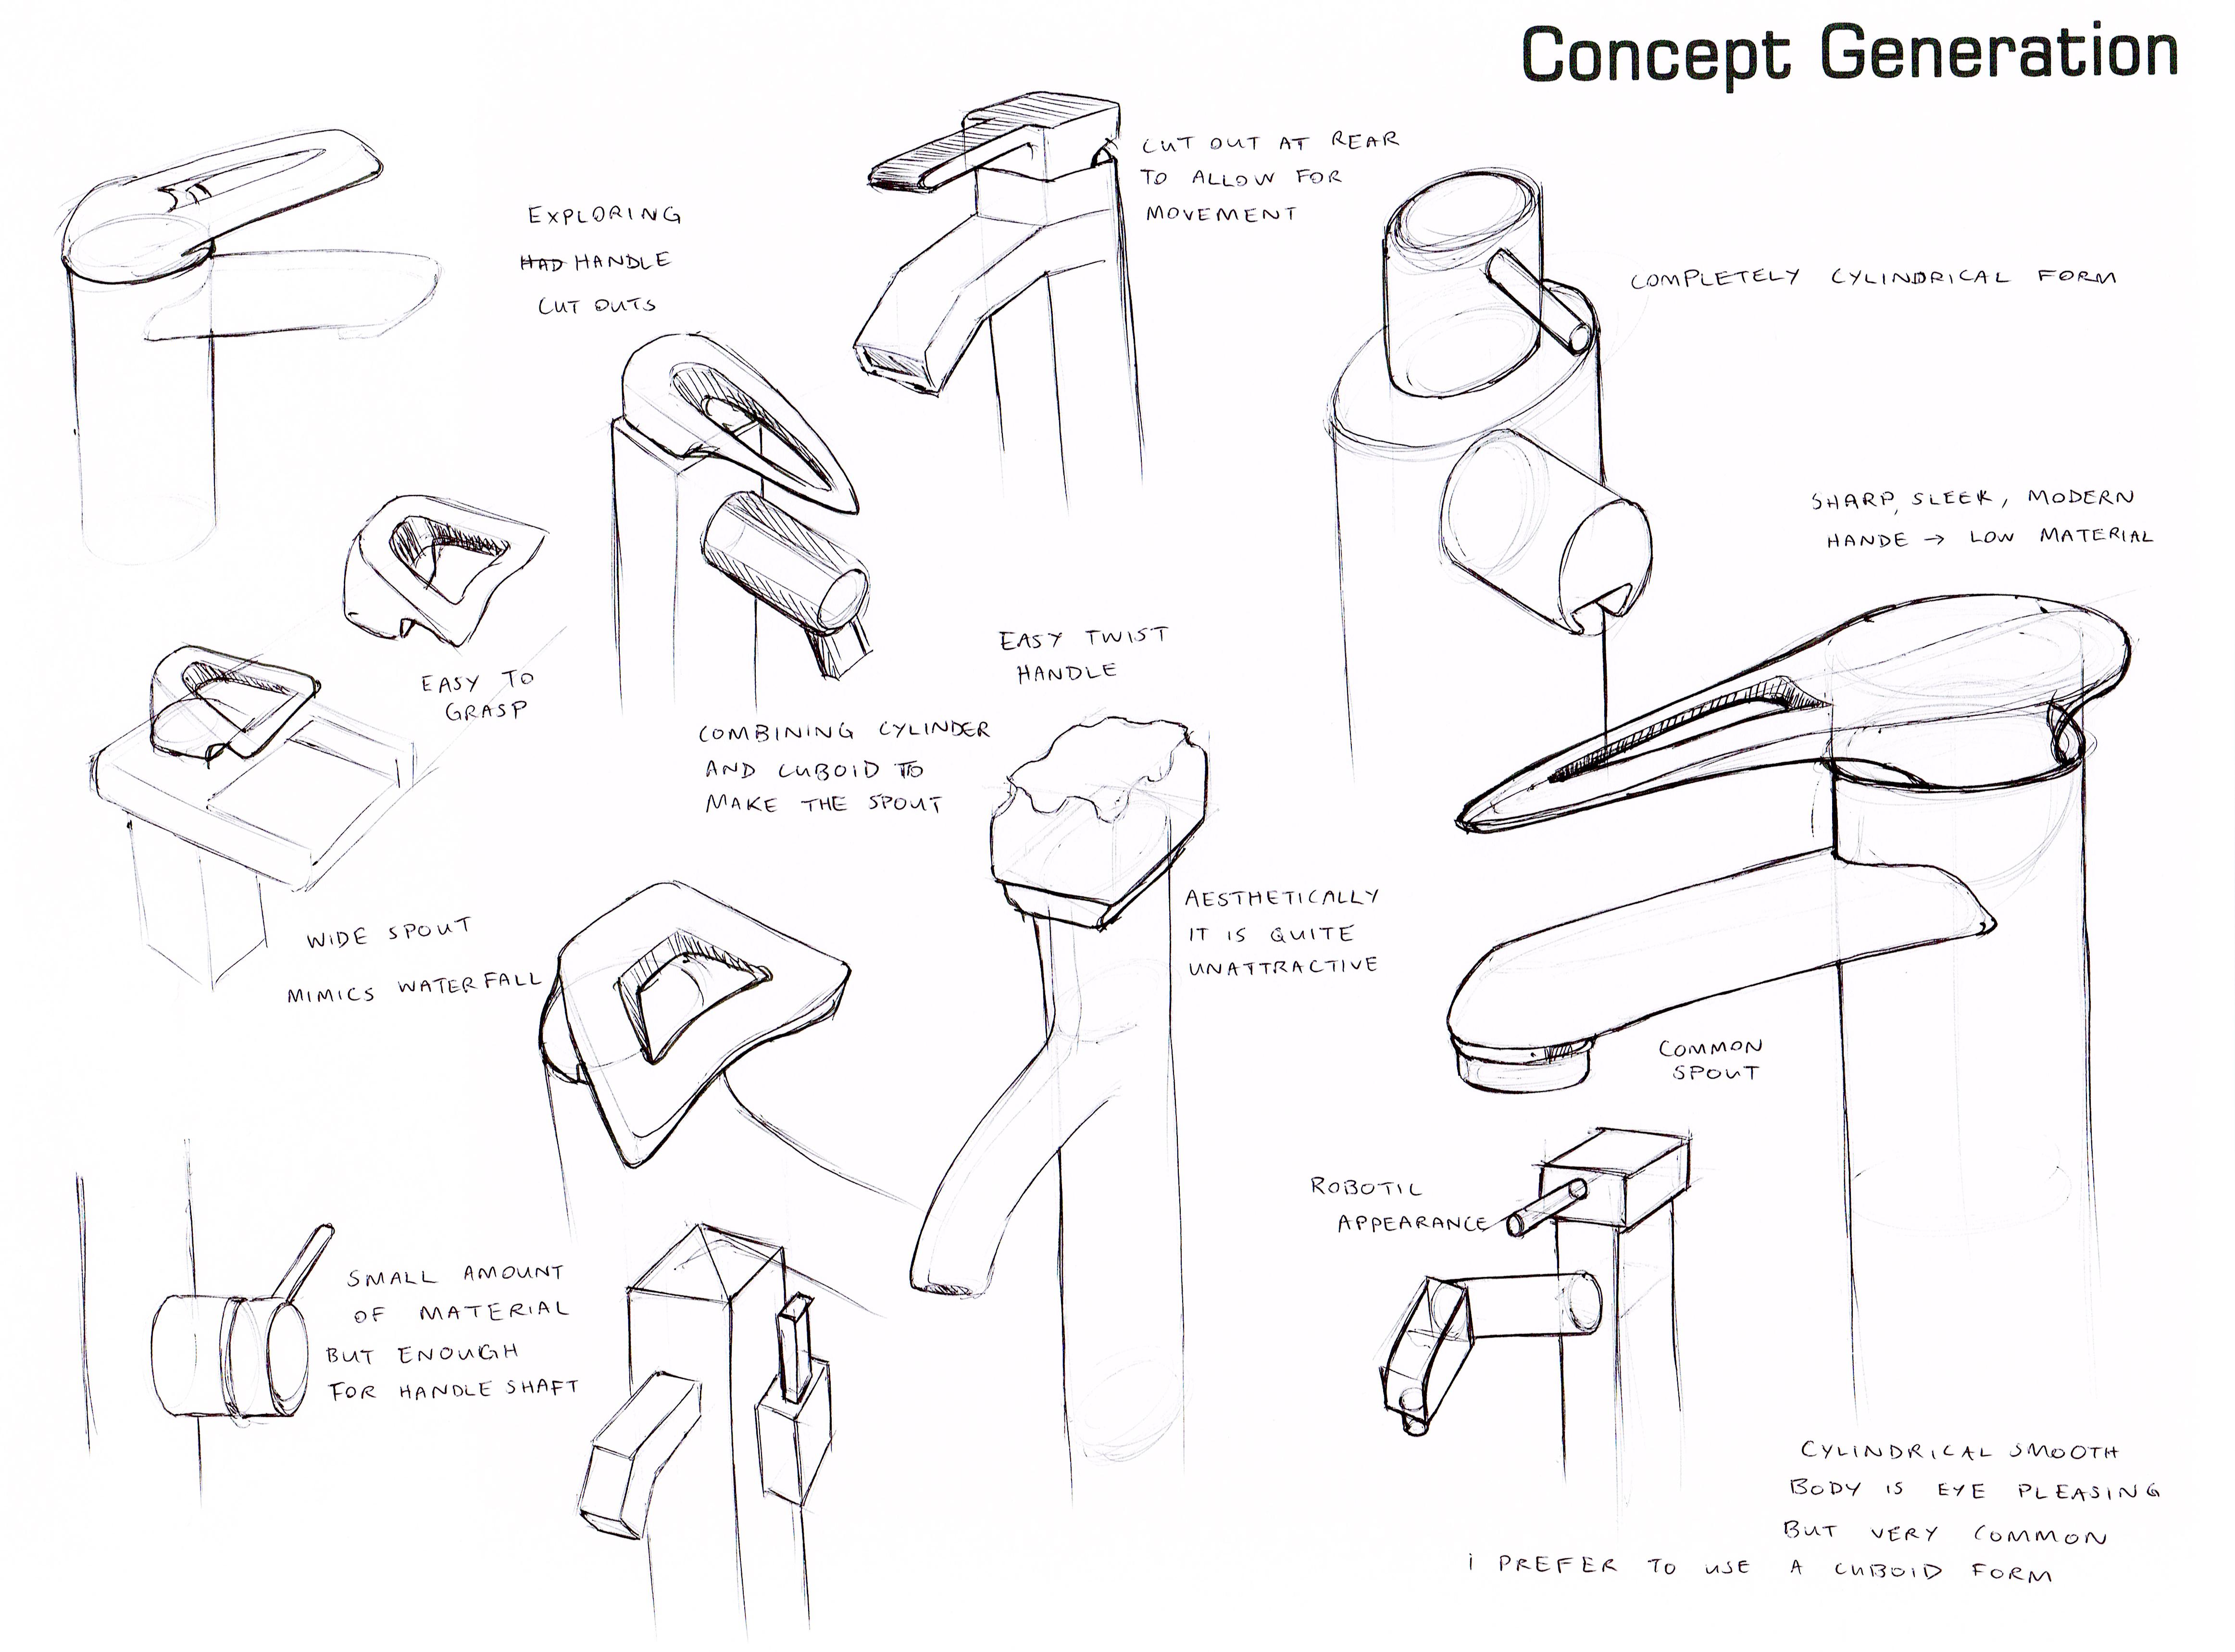 Concept Generation 3